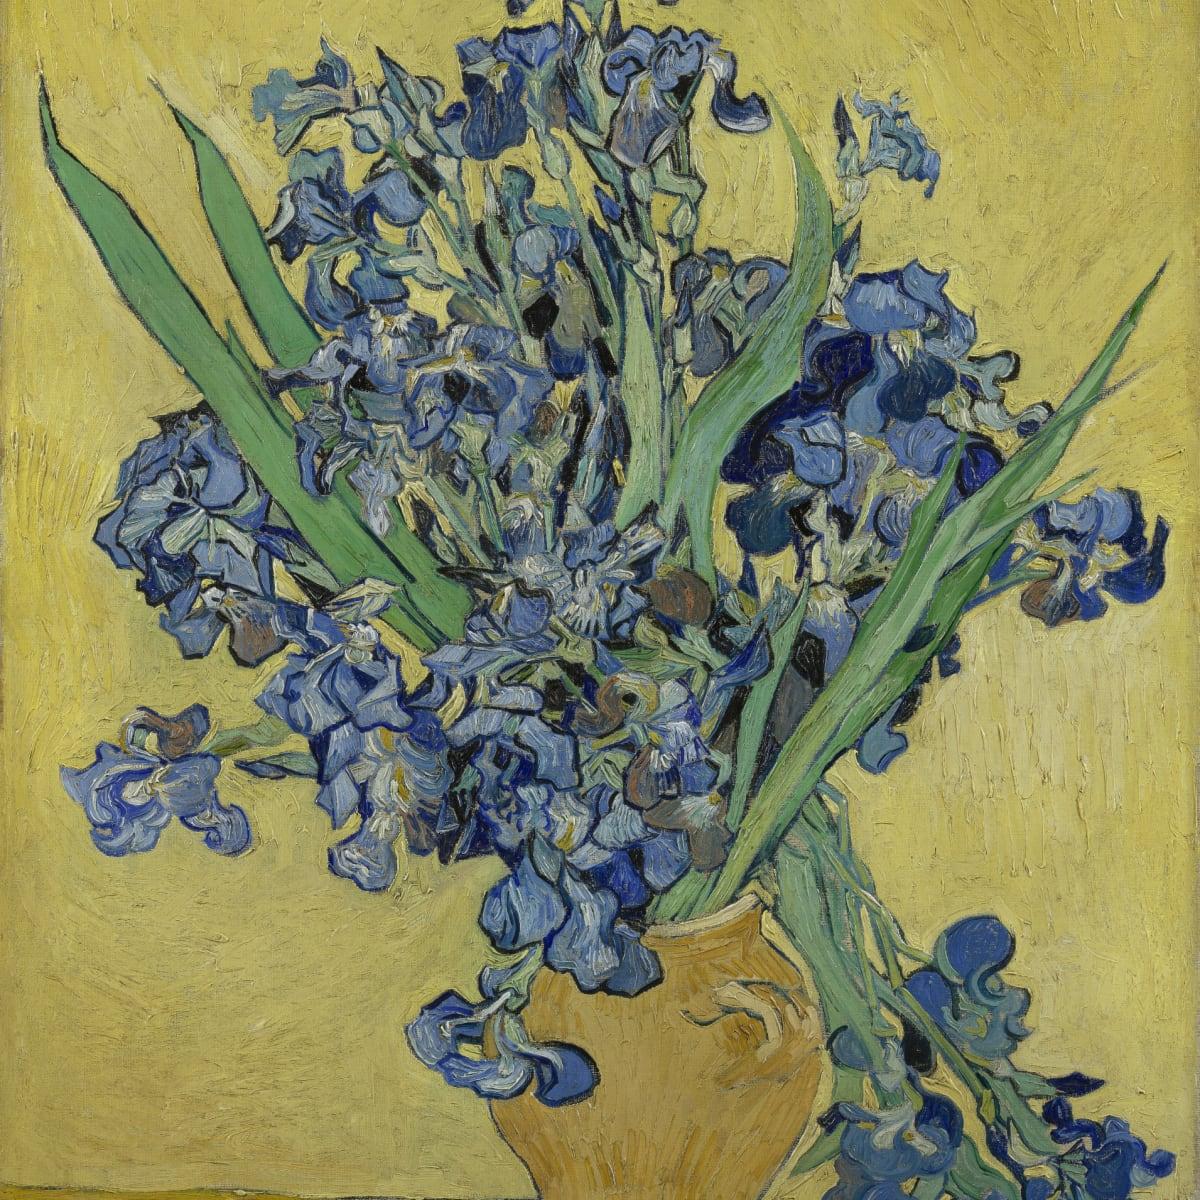 MFAH:Vincent van Gogh: His Life in Art, Irises